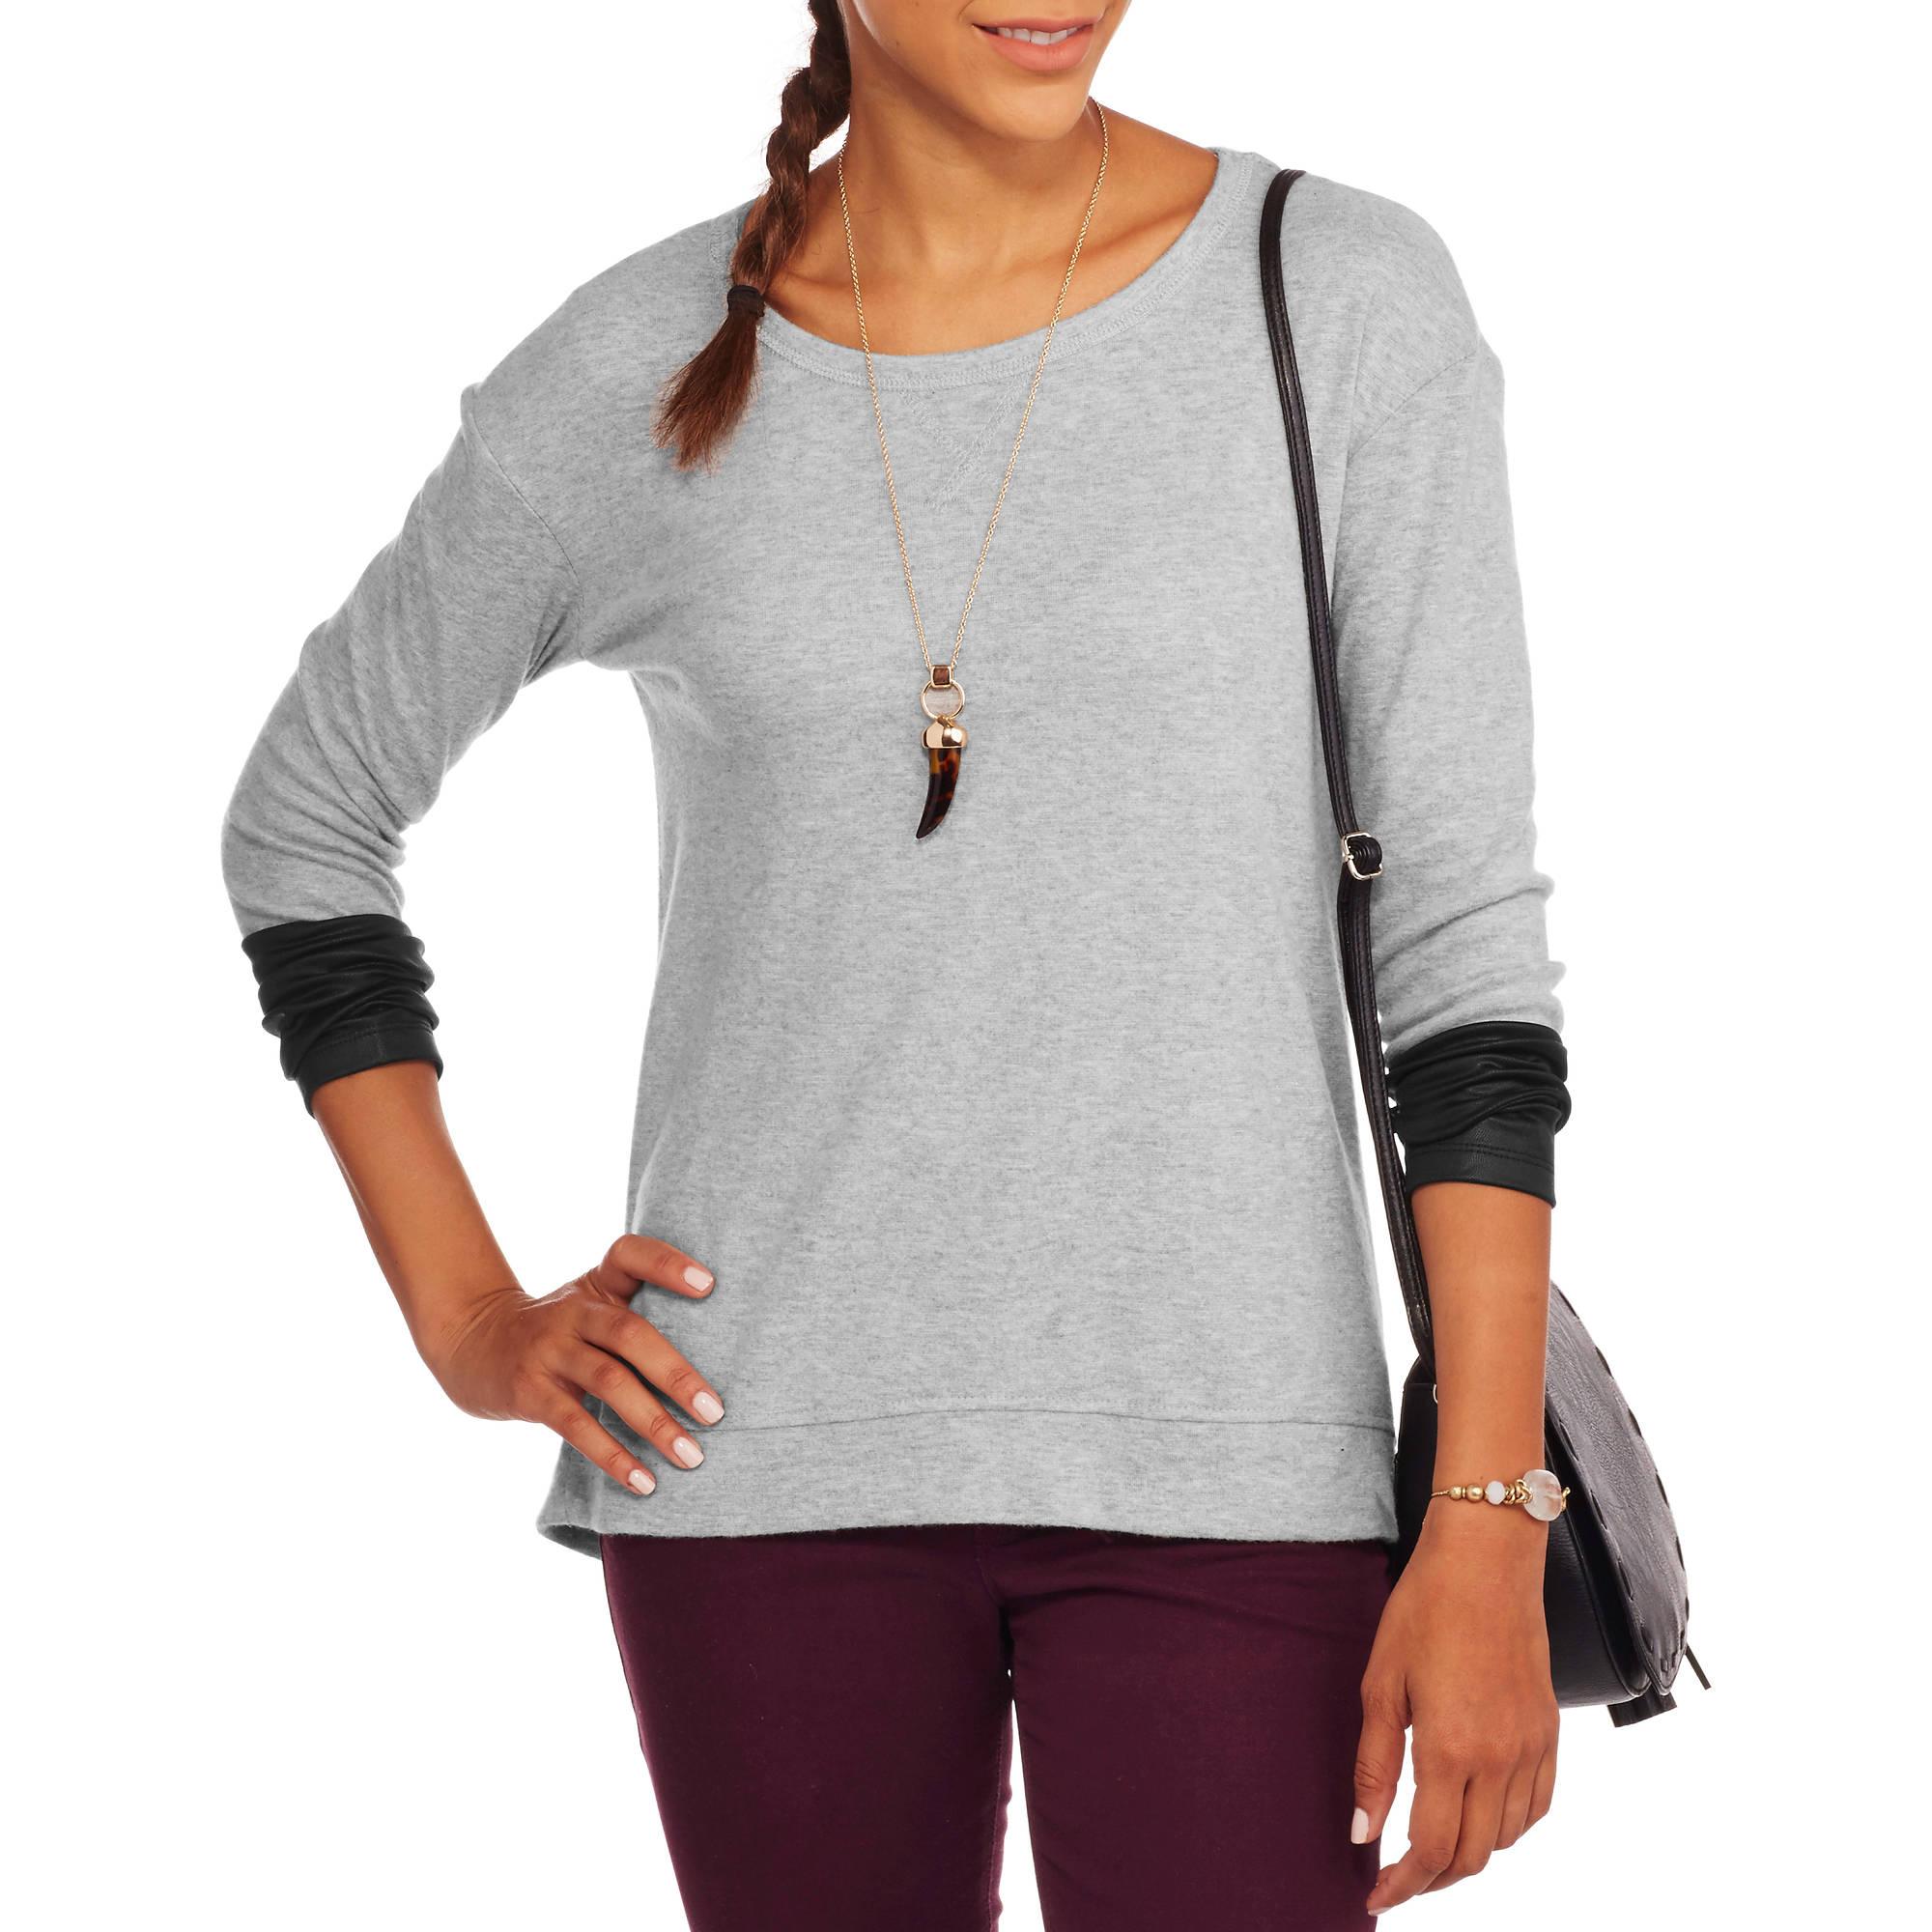 French Laundry Women's Cozy Fleece Fashion Sweatshirt With Contrast Cuffs